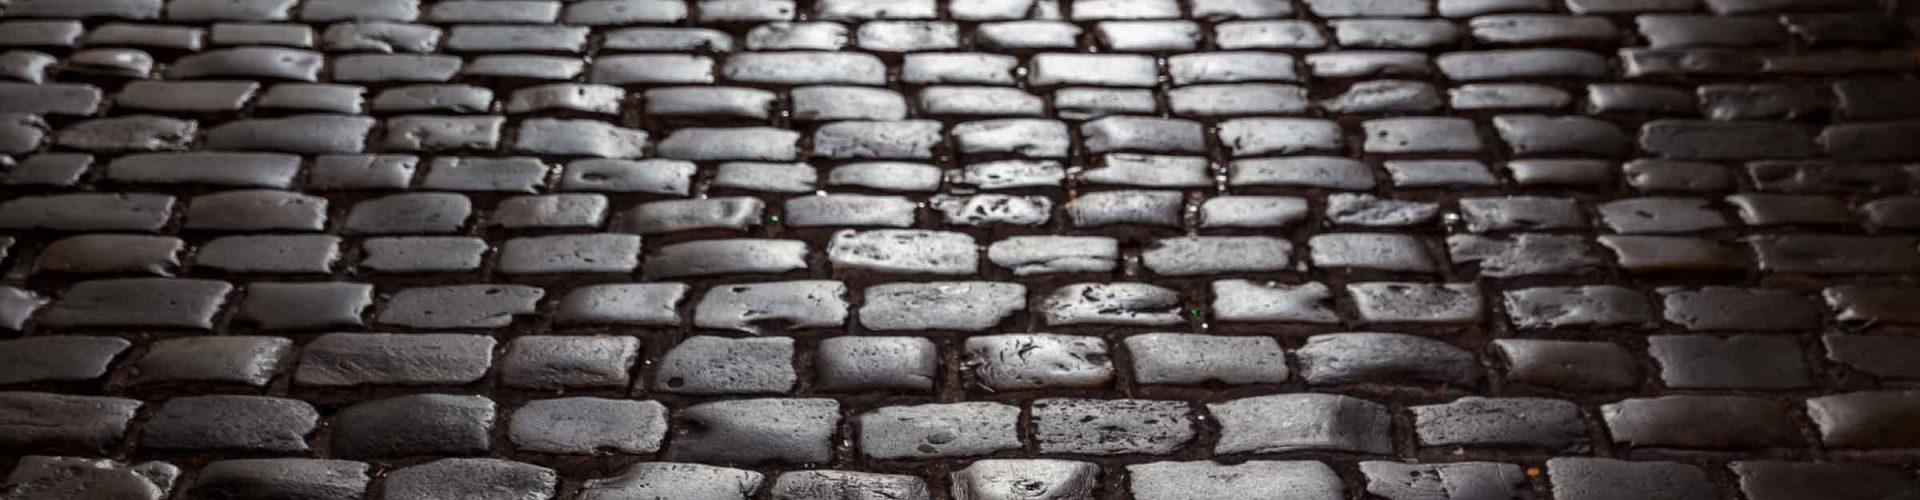 cobbles on a dark street